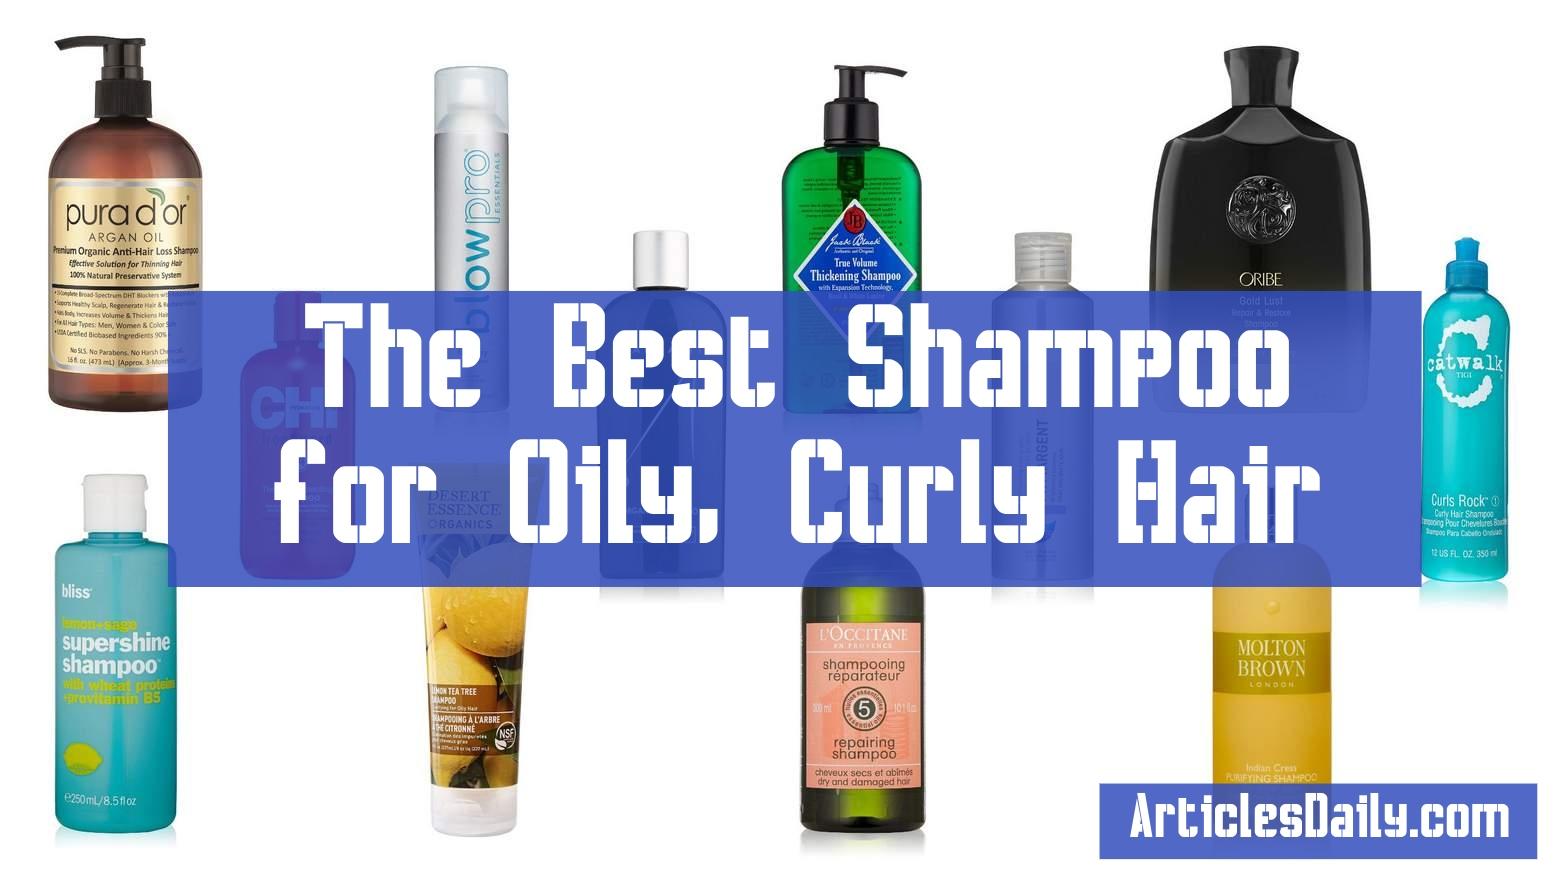 The Best Shampoo for Oily, Curly Hair-articlesdaily.com-shmilon